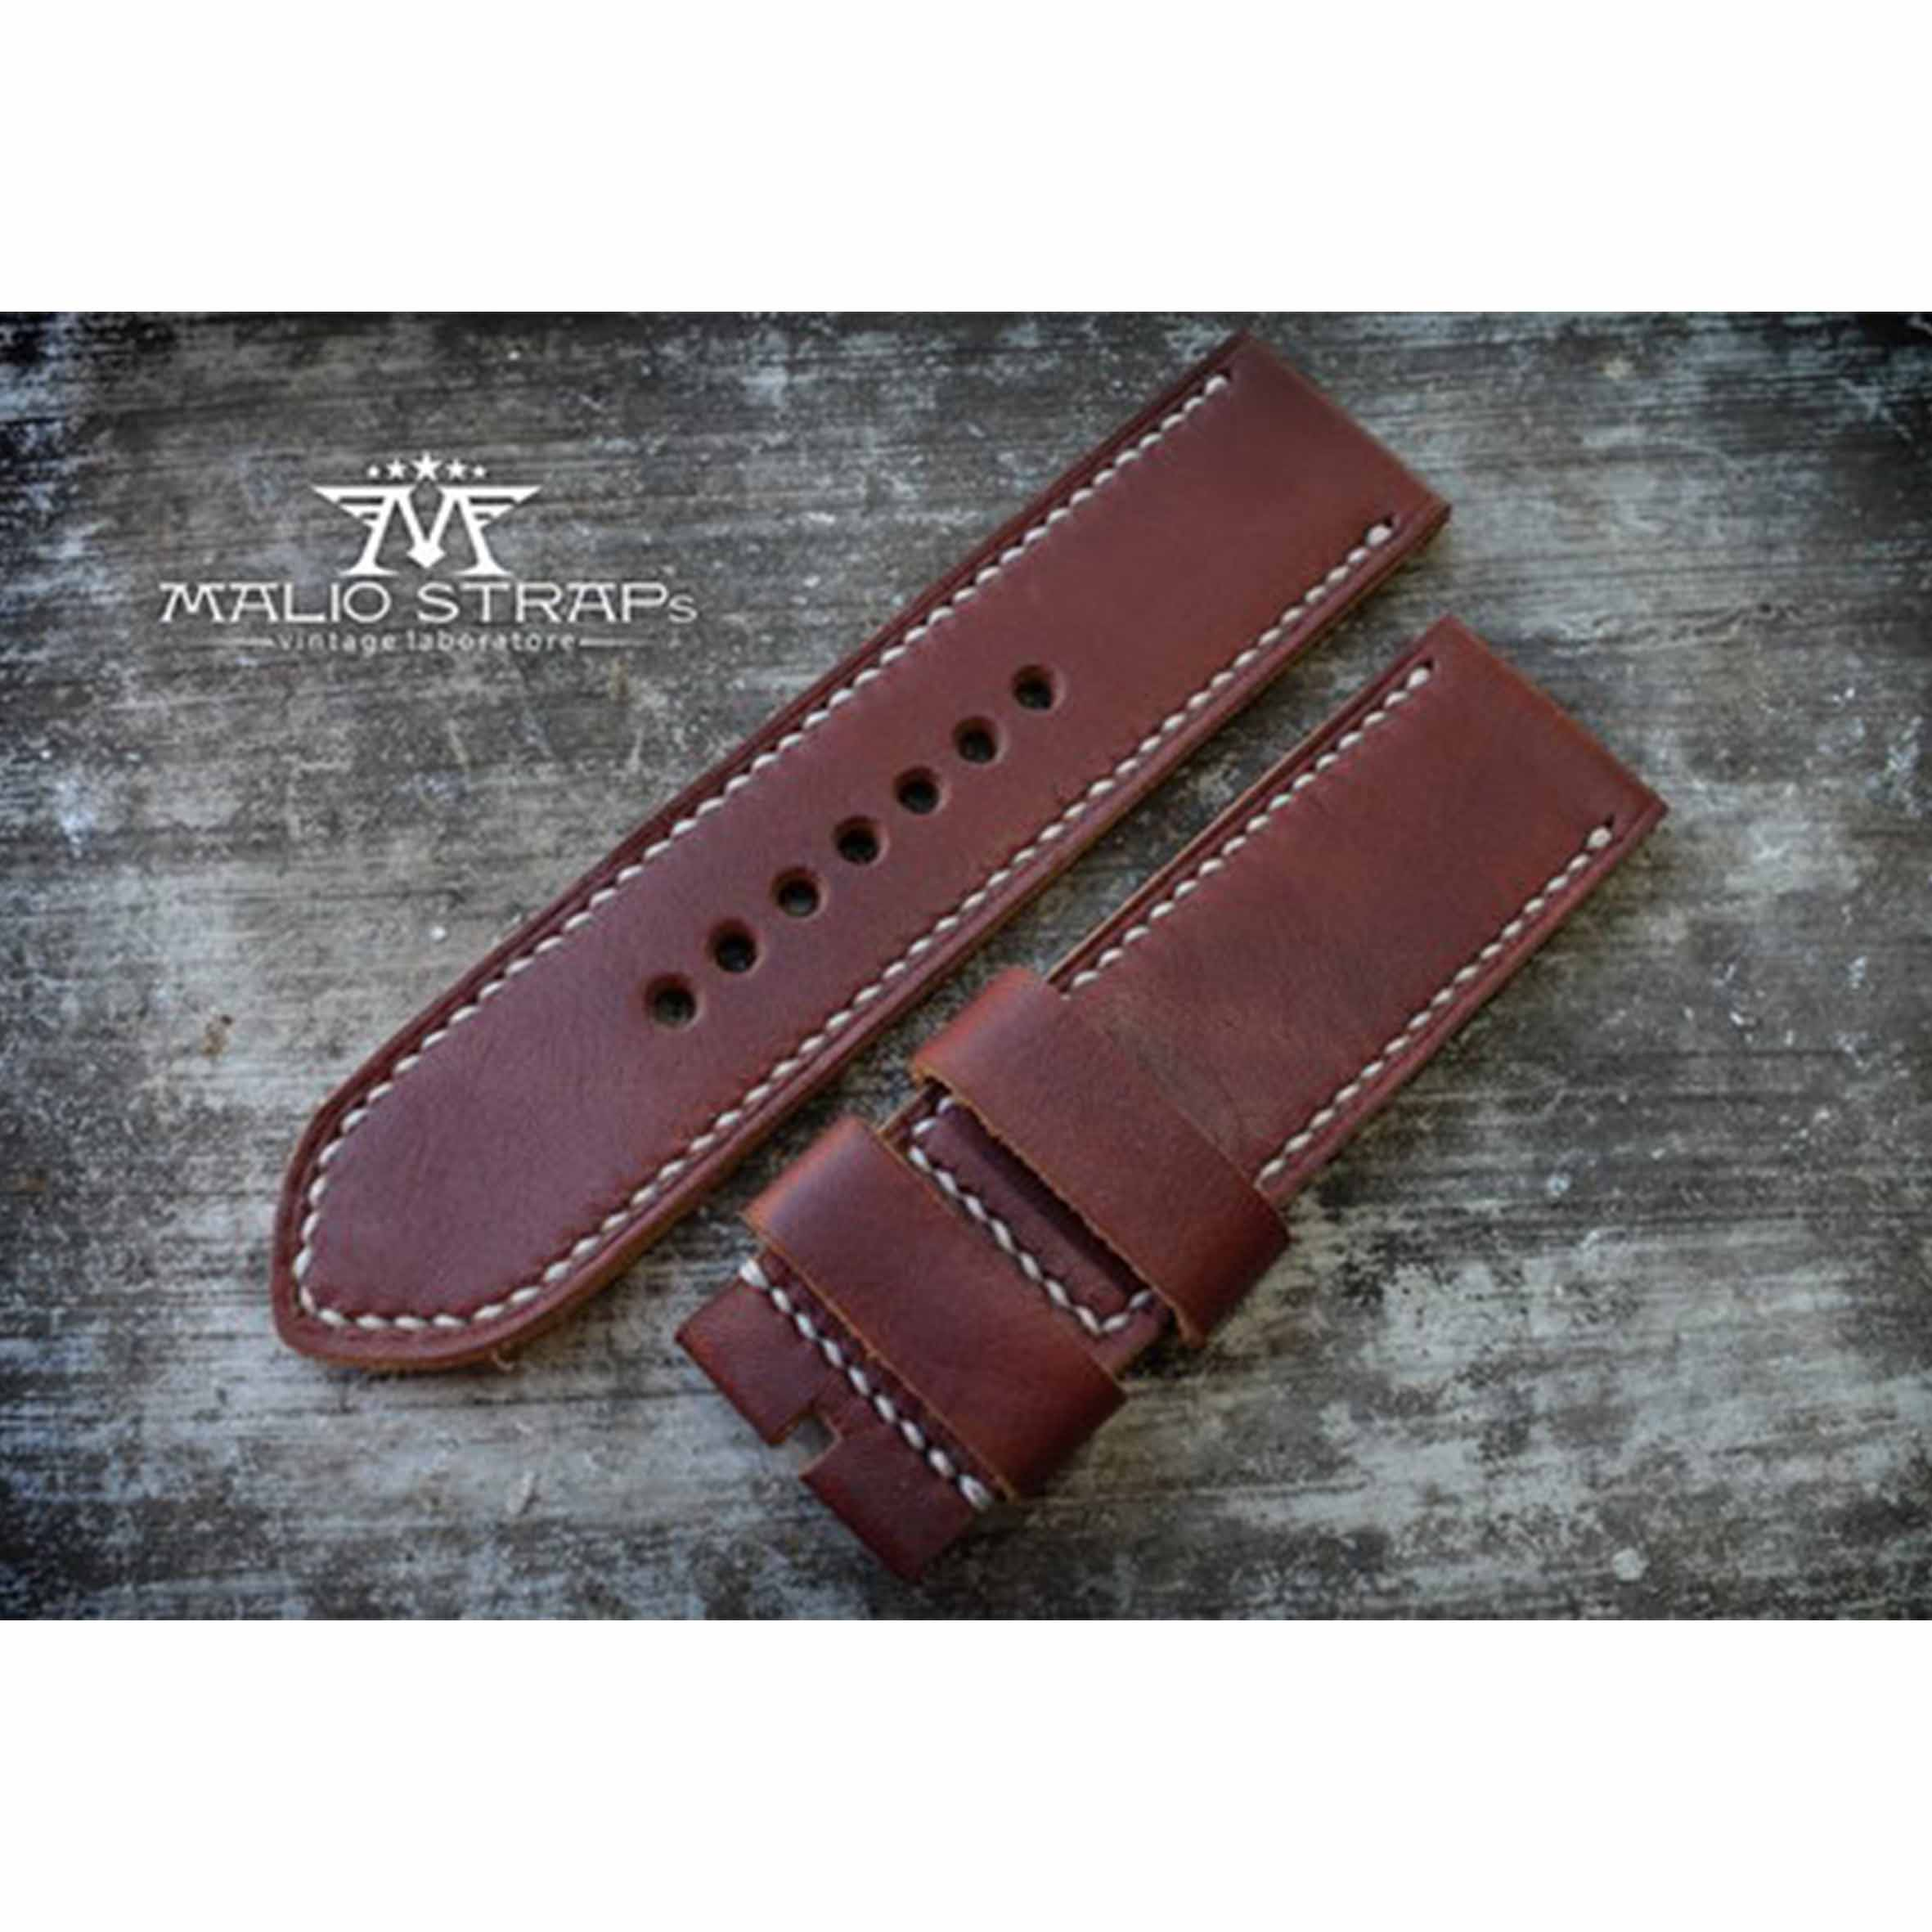 malio-straps-372-serie-strapsonly (1)